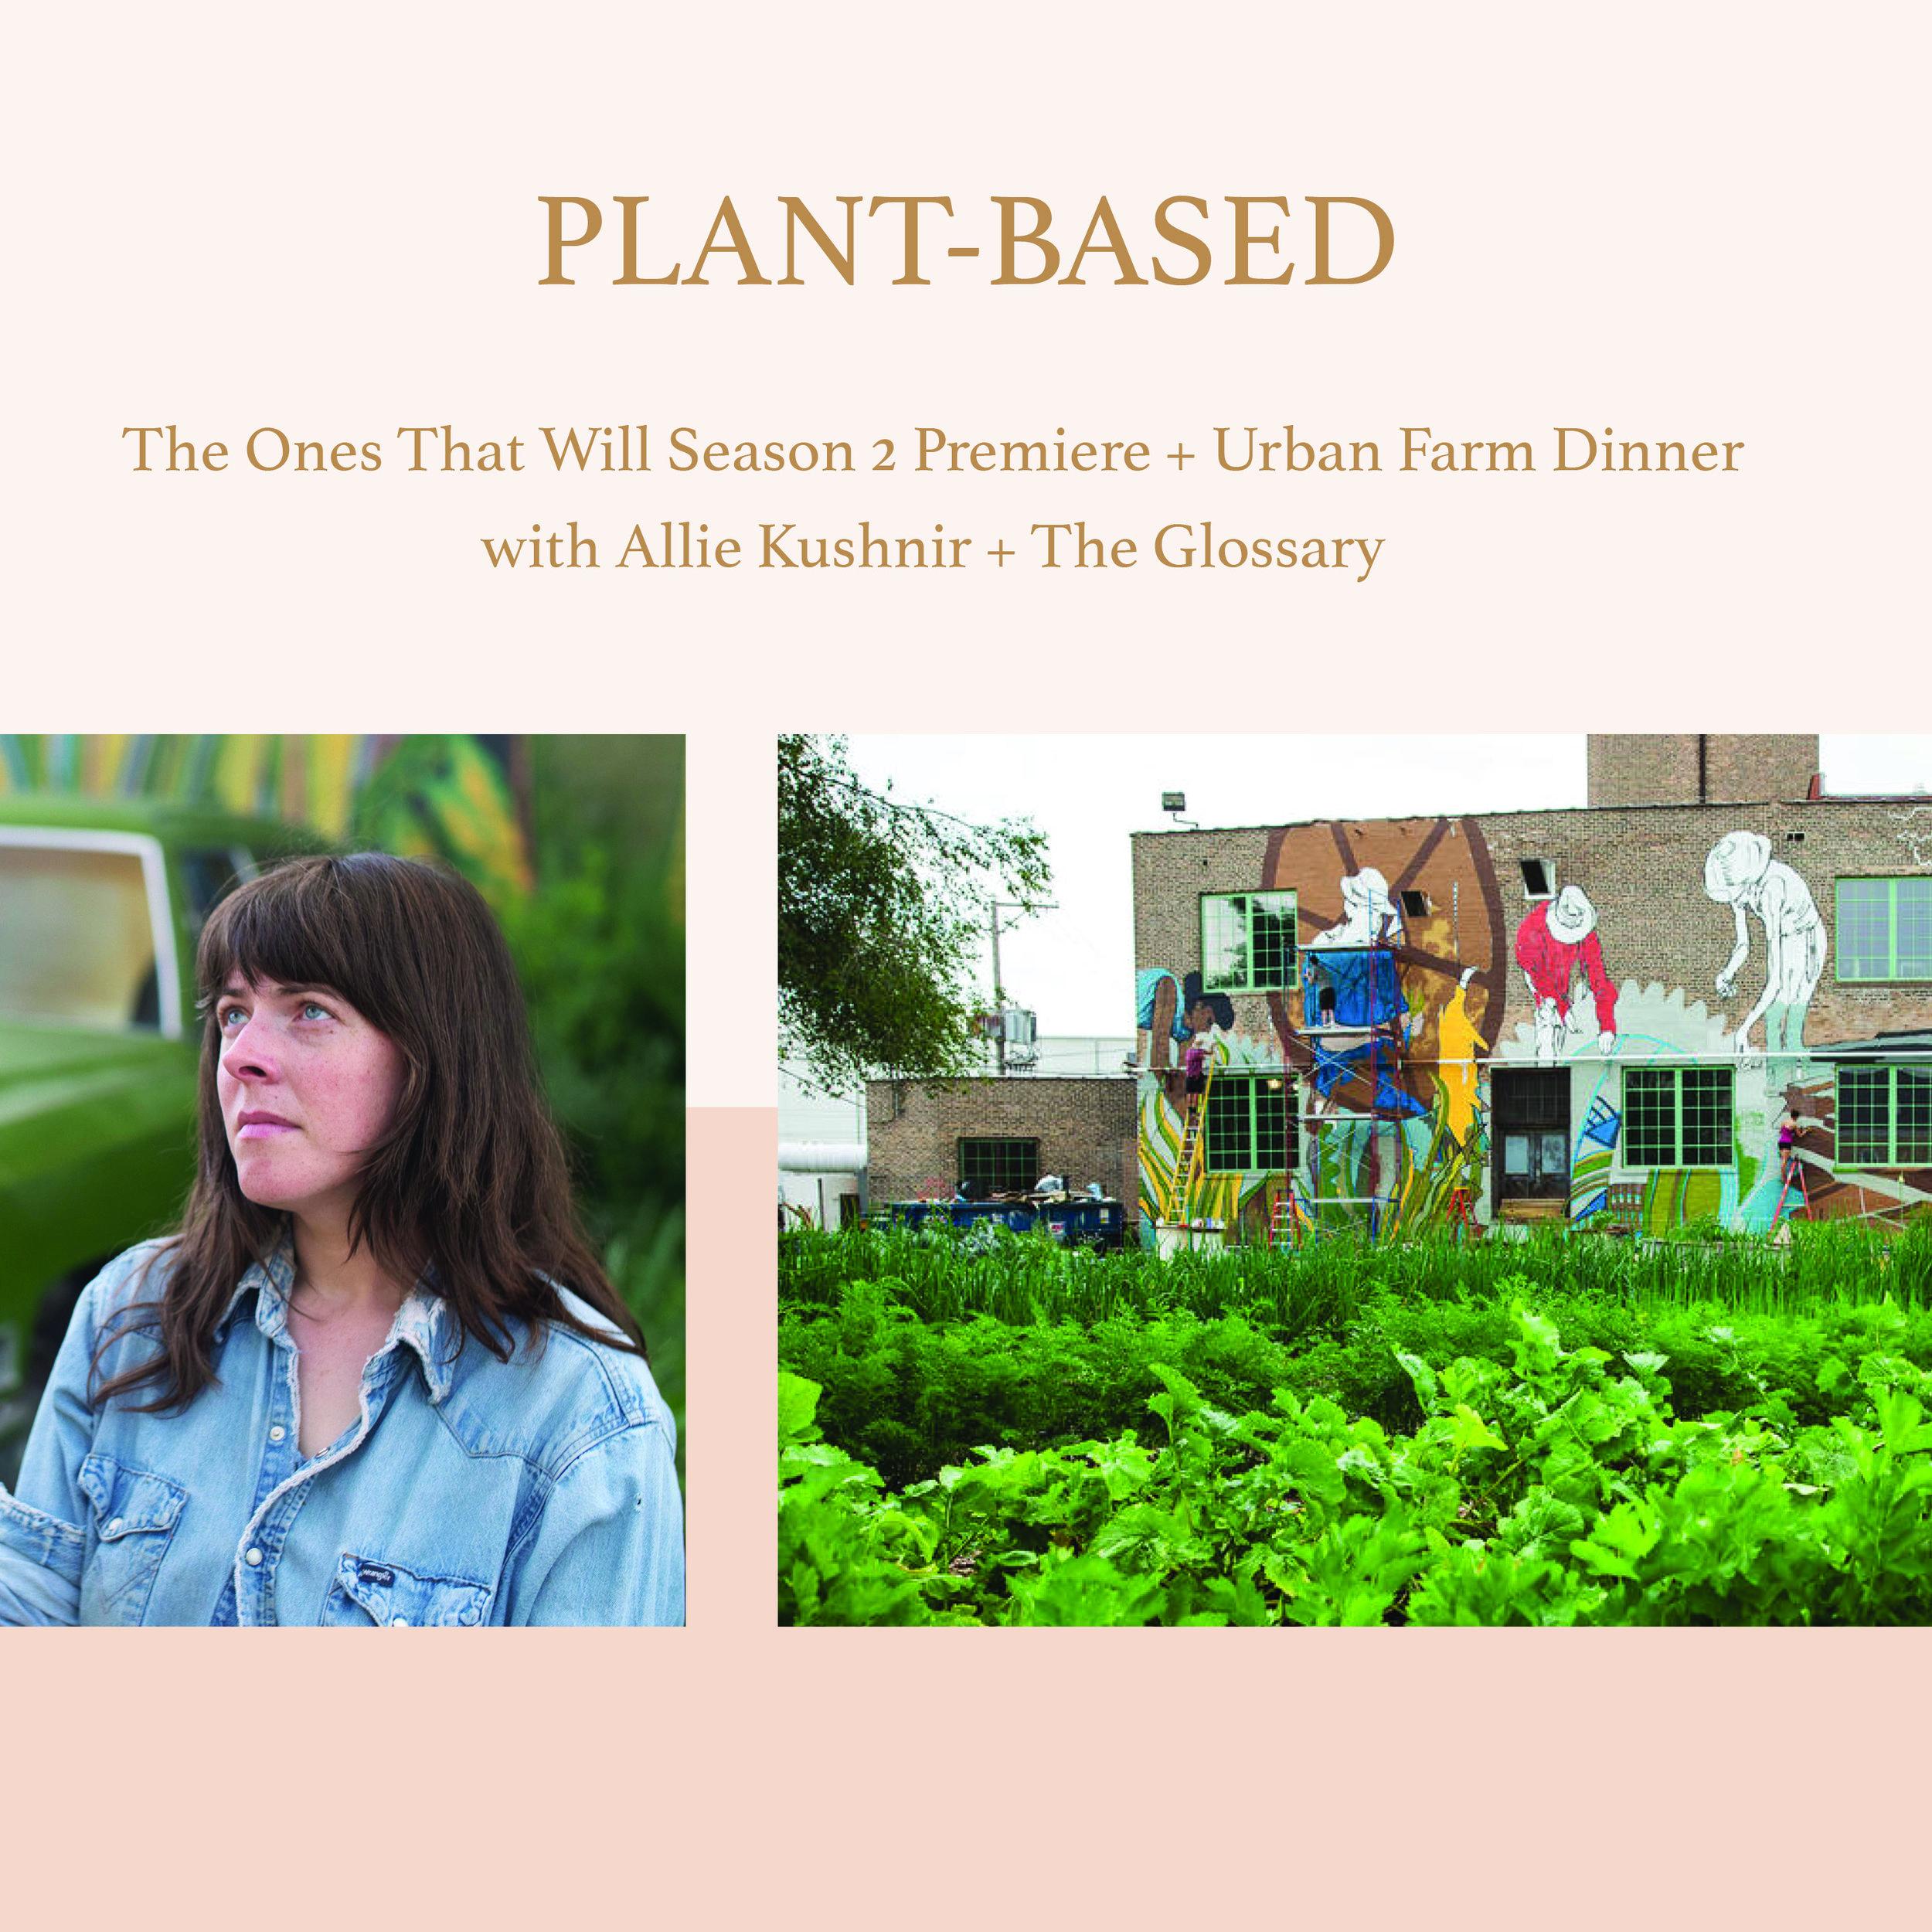 Plant Dinner event square.jpg